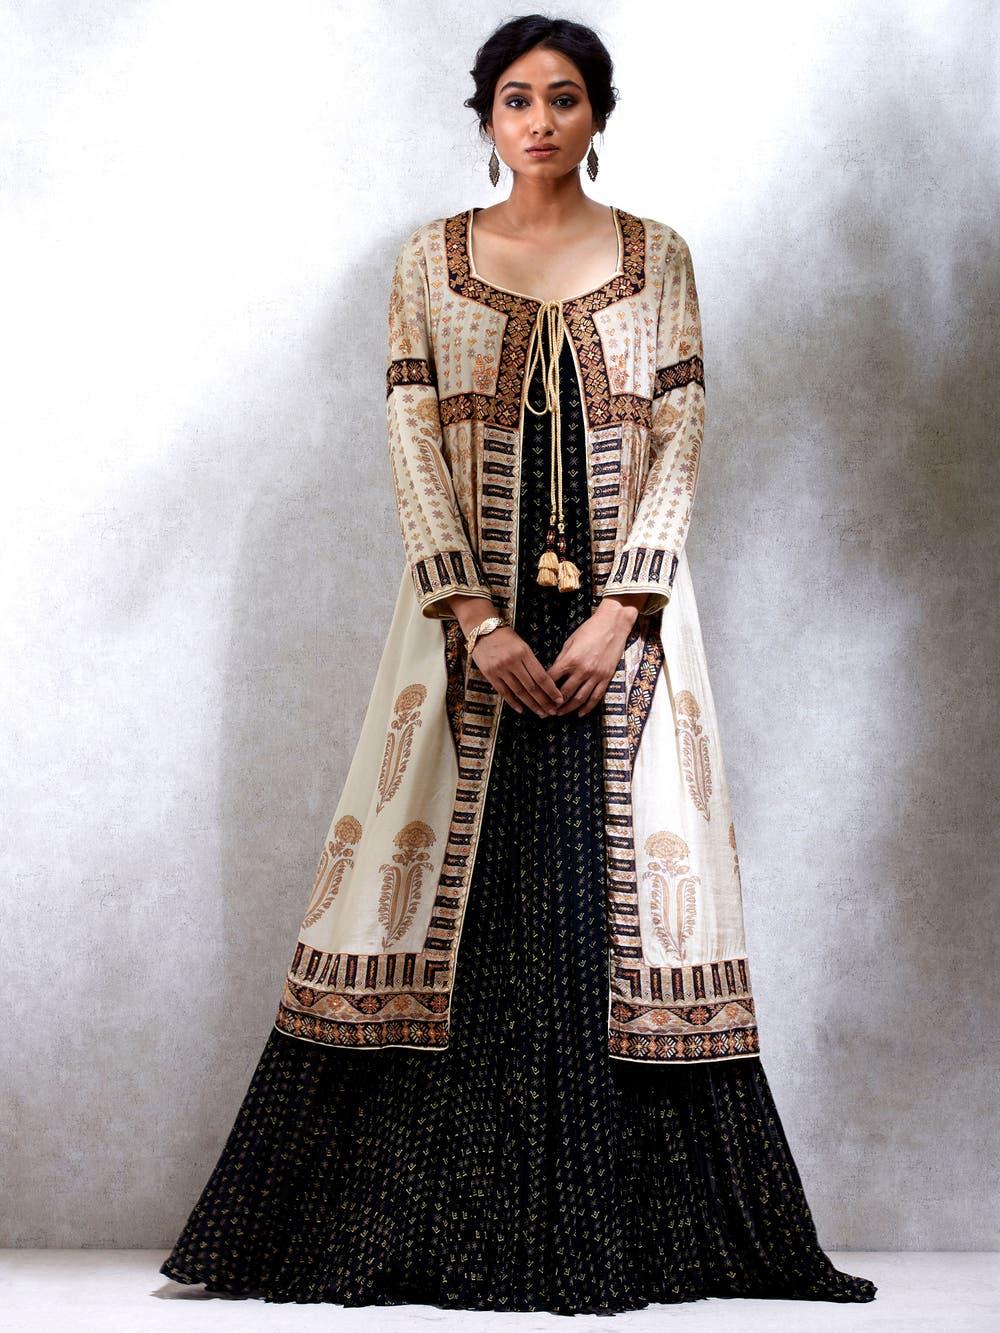 Aditi Rao Hydari in a Beige & Ivory Embroidered Kurta With Jacket